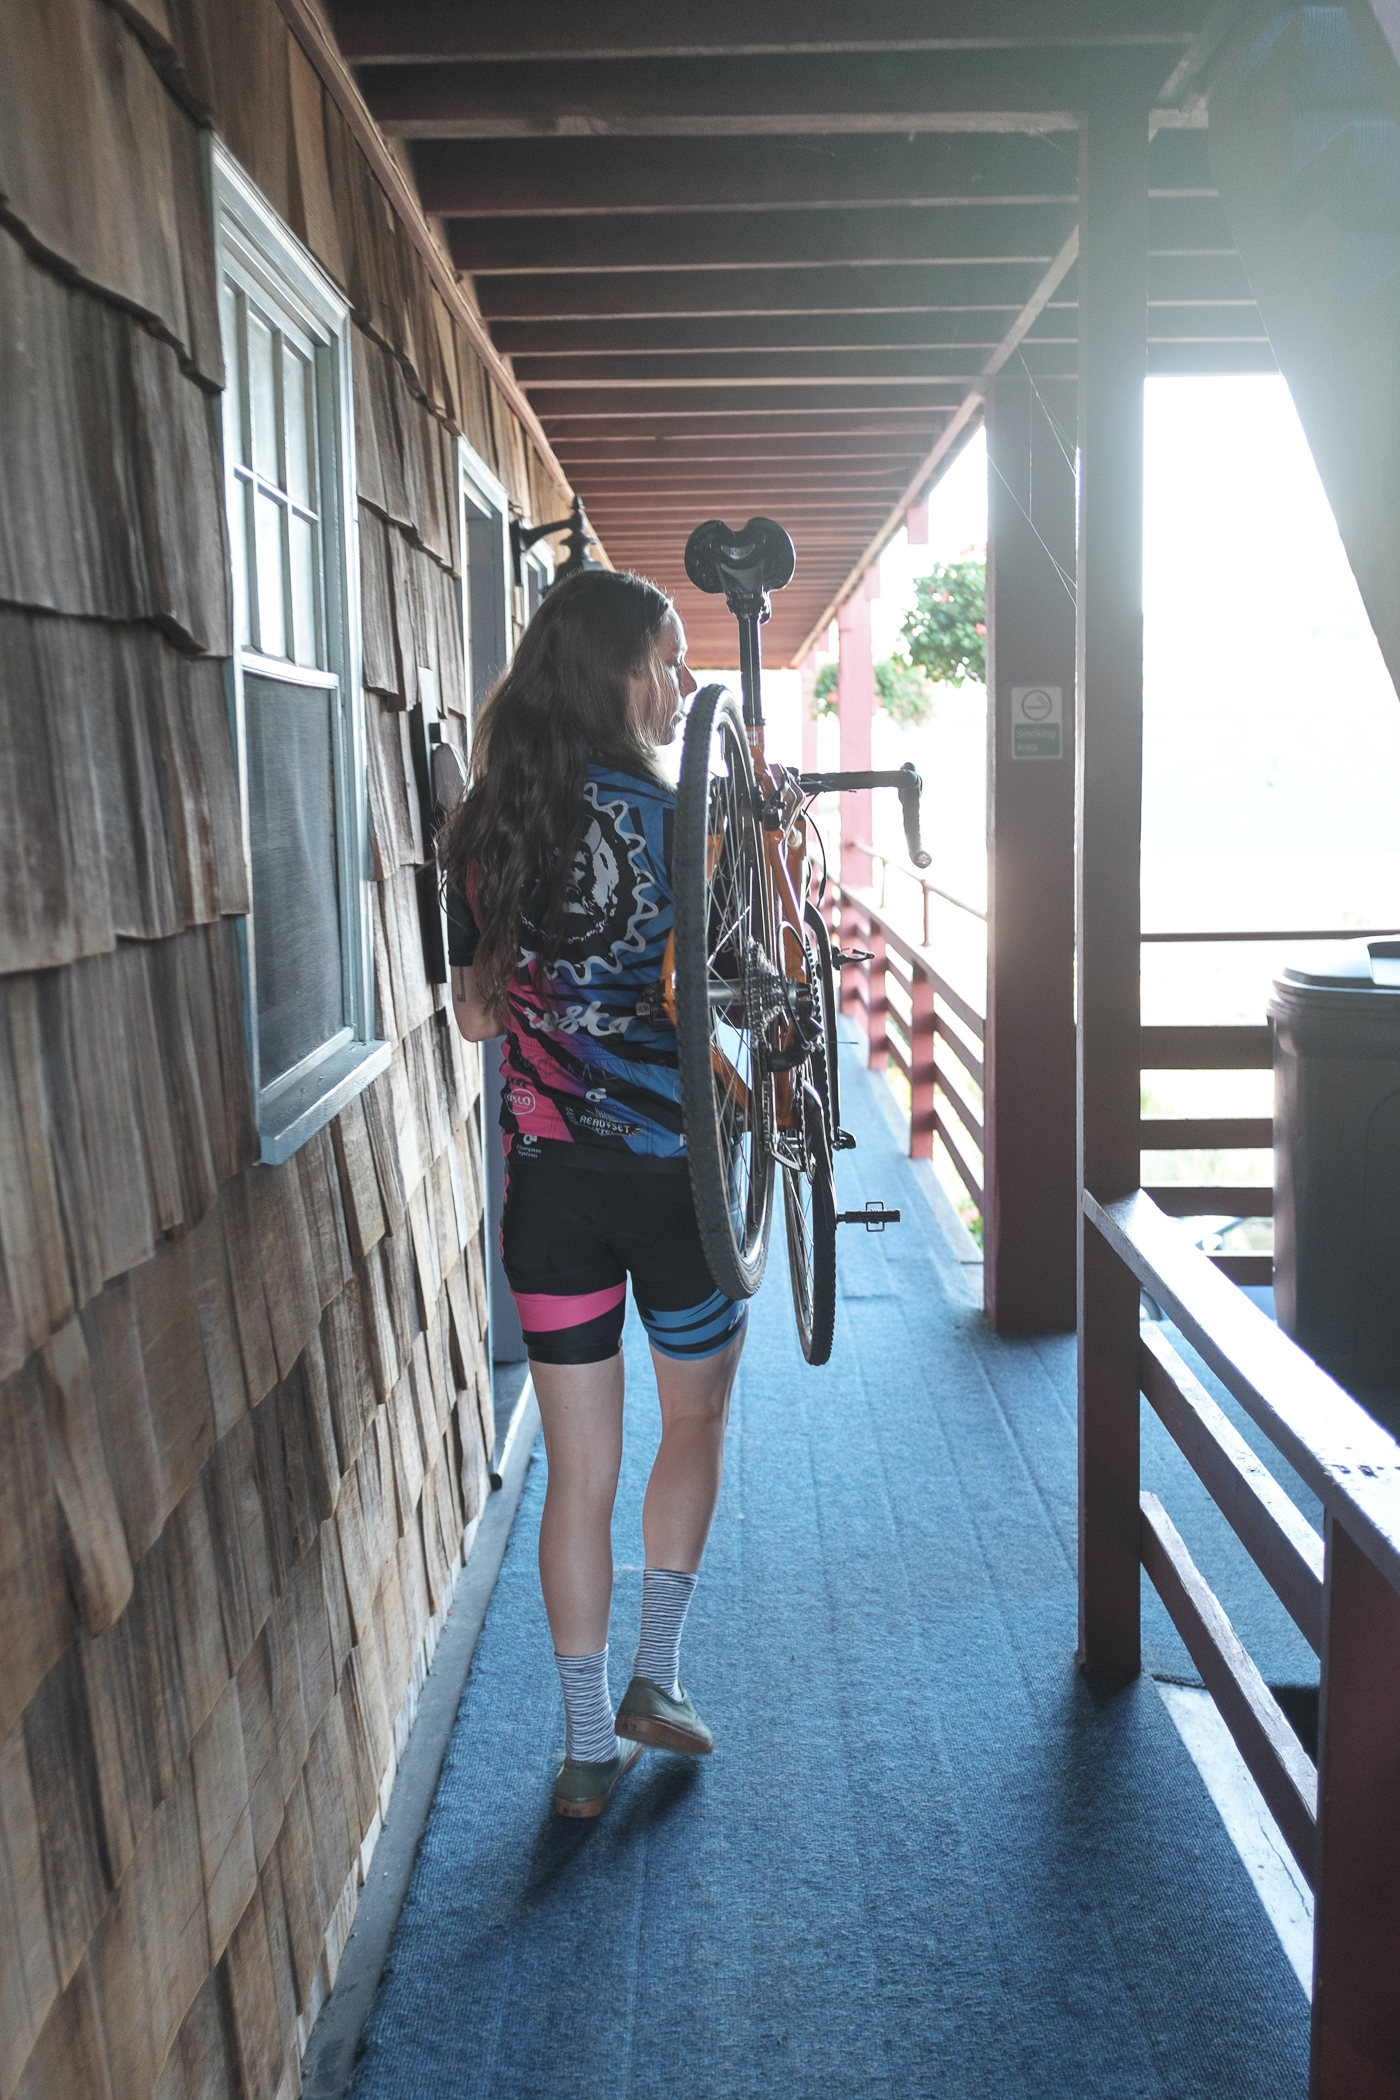 141009_Cyclocross_Pretty_Damned_Fast_Heather_Jen_Jordan_Rough_edits-7.jpg